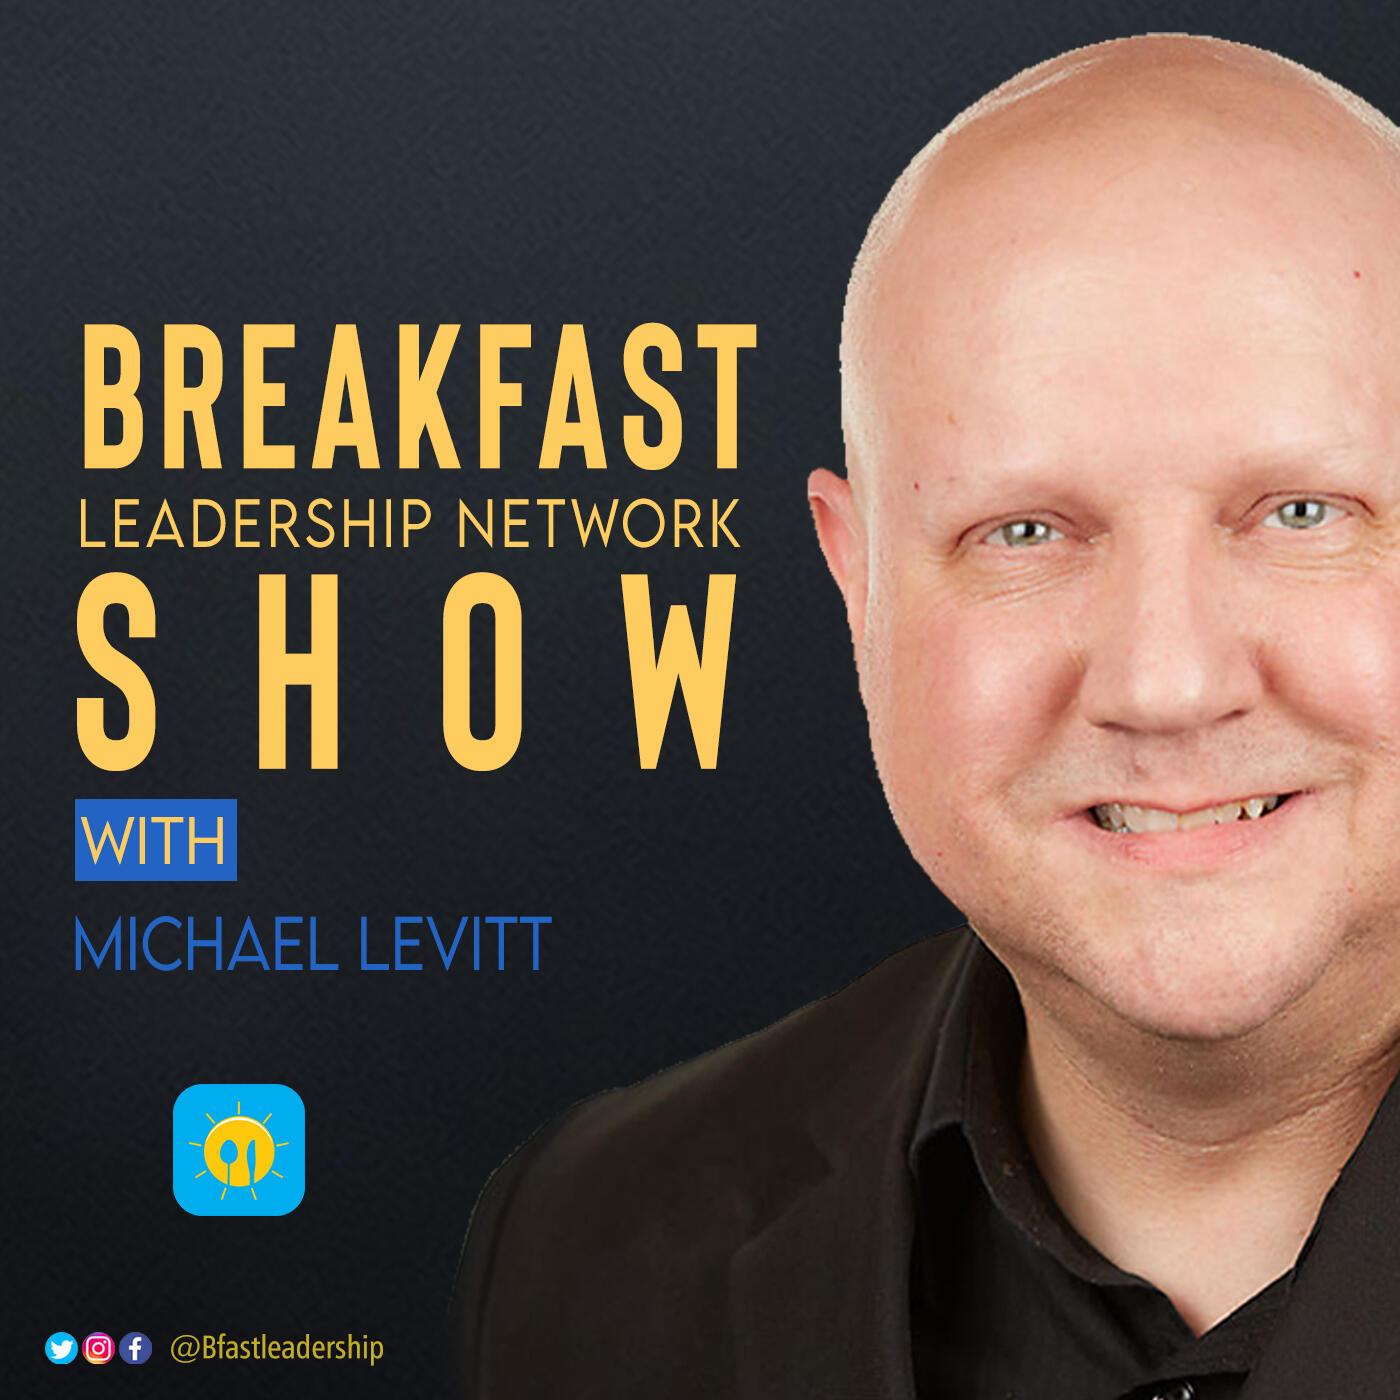 Breakfast Leadership Show